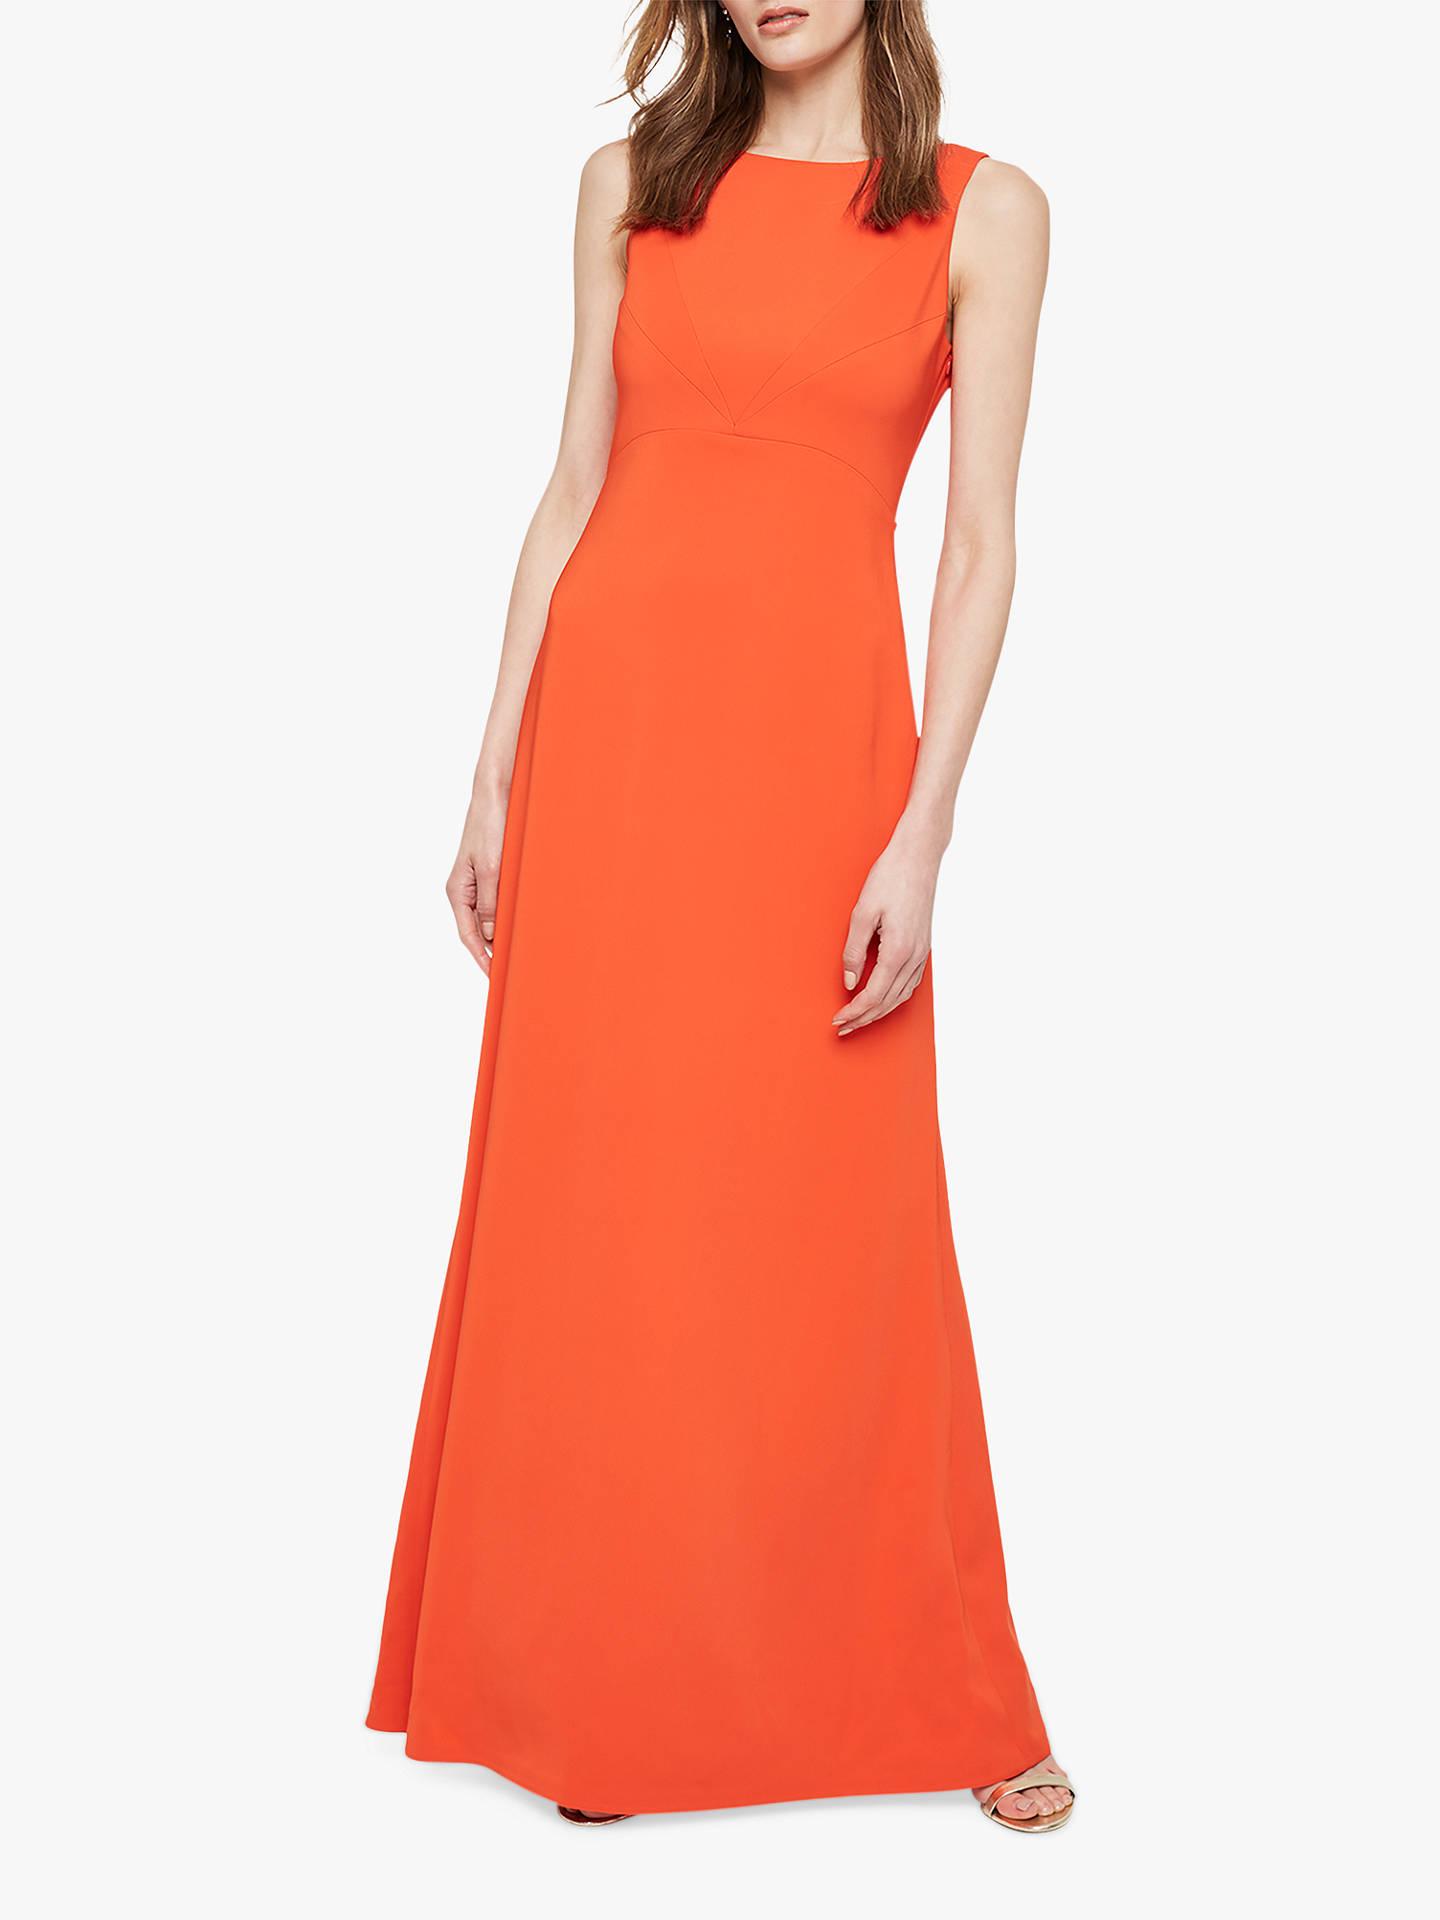 5afa2cc1b1c07 Damsel in a Dress Elise Tie Back Dress, Orange